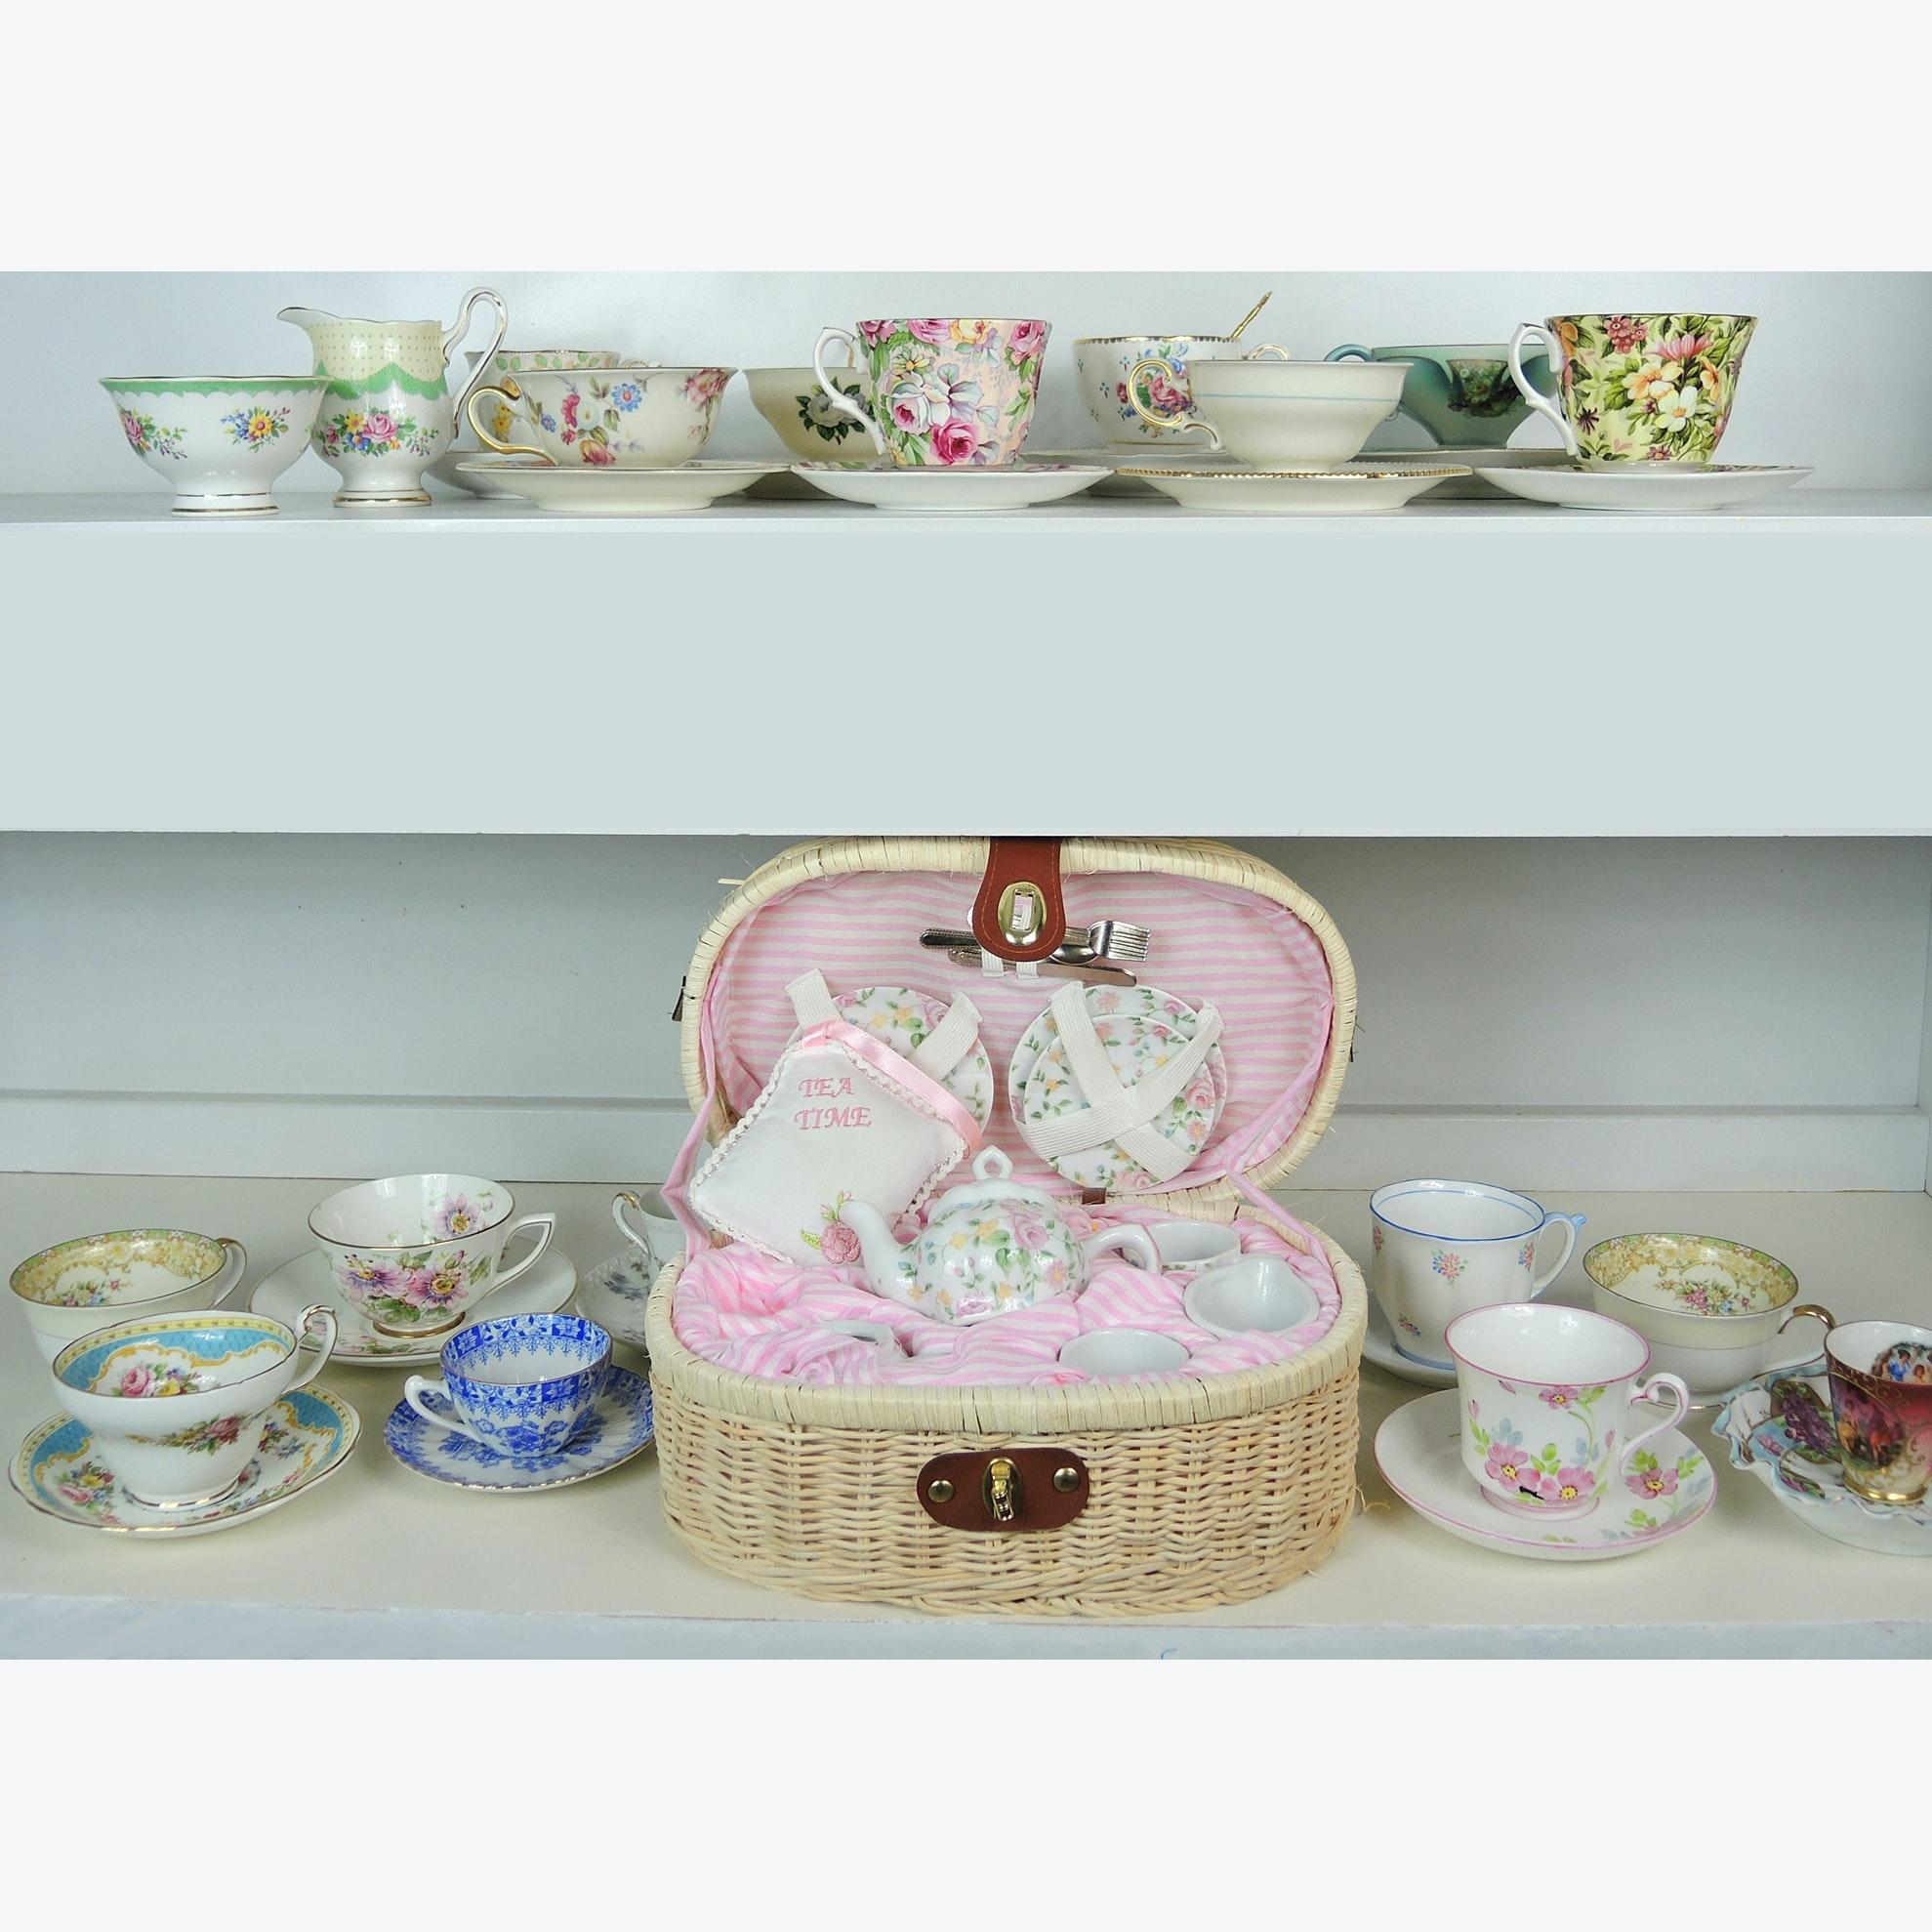 Porcelain Tea Cup Collection and Child's Tea Set